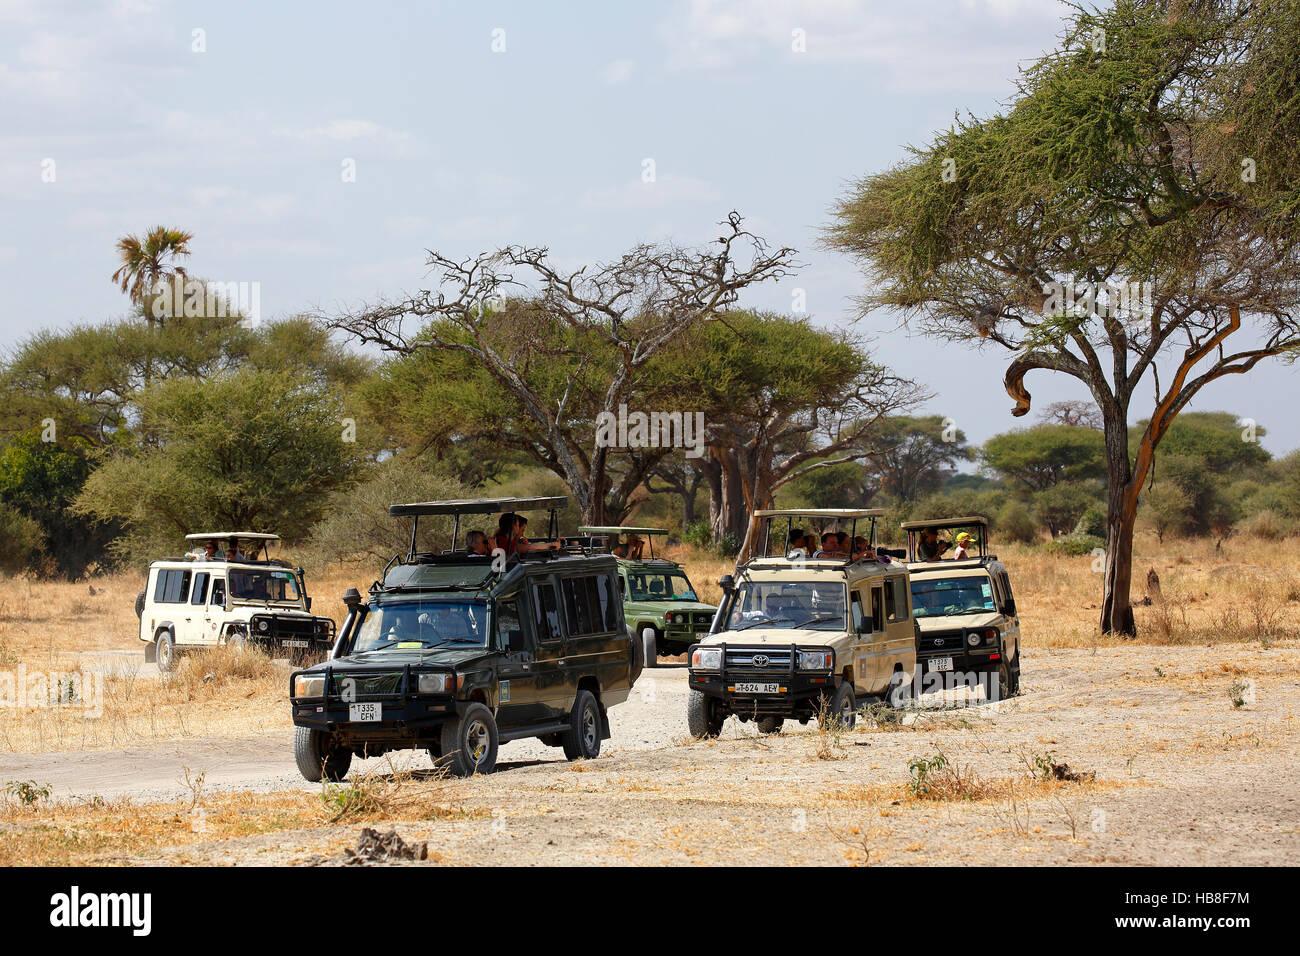 Tourists on safari, ATVs driving through bush, Ngorongoro, Serengeti National Park, Tanzania - Stock Image